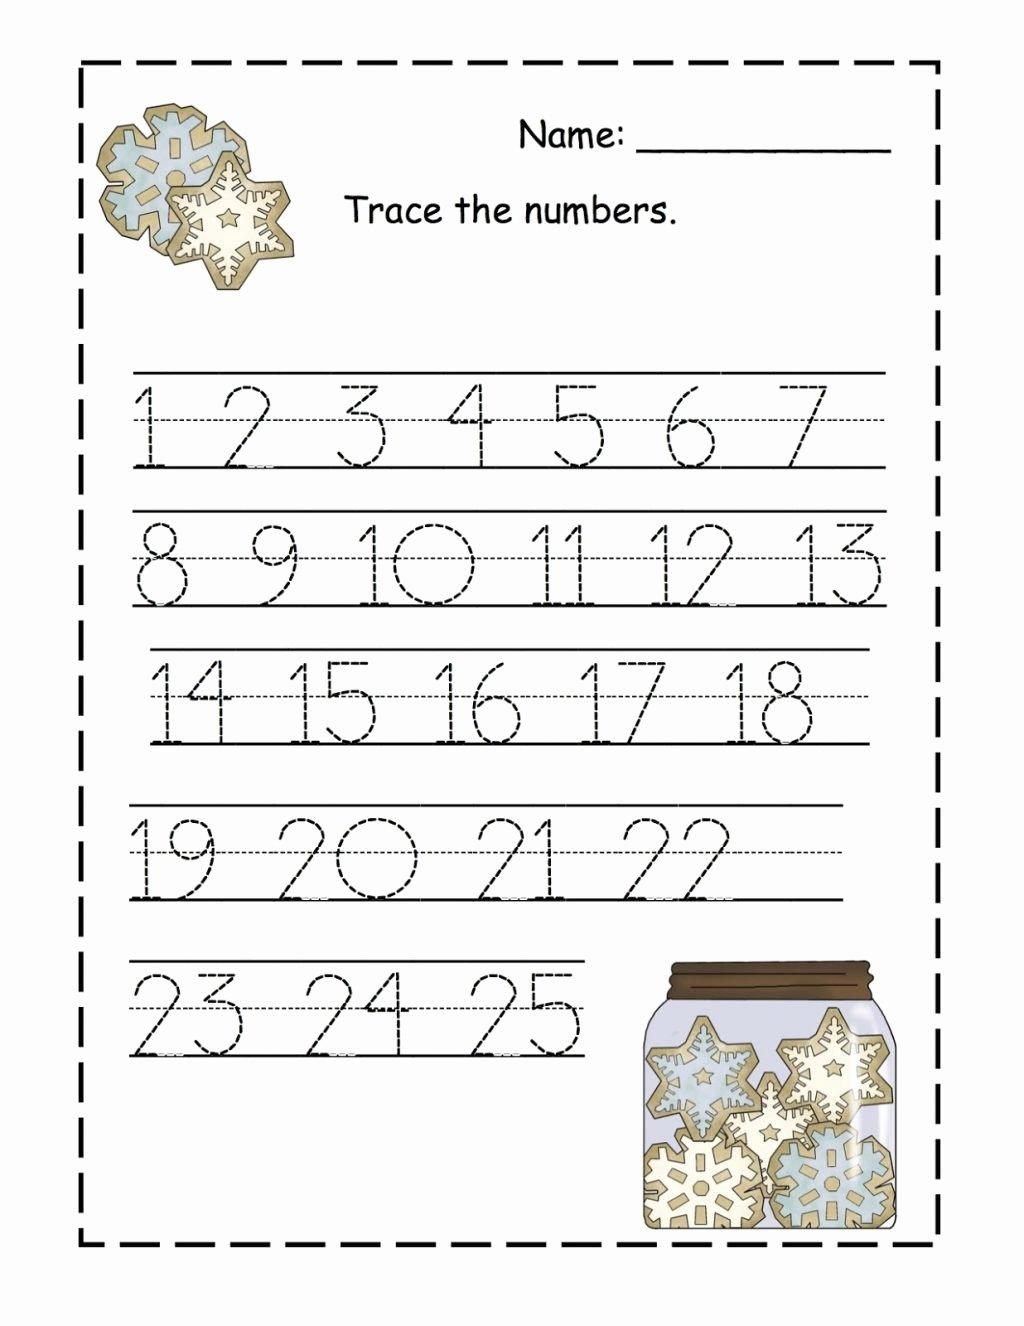 Name Worksheets for Preschoolers Lovely Worksheet Worksheet Preschool Printing Worksheets Fabulous